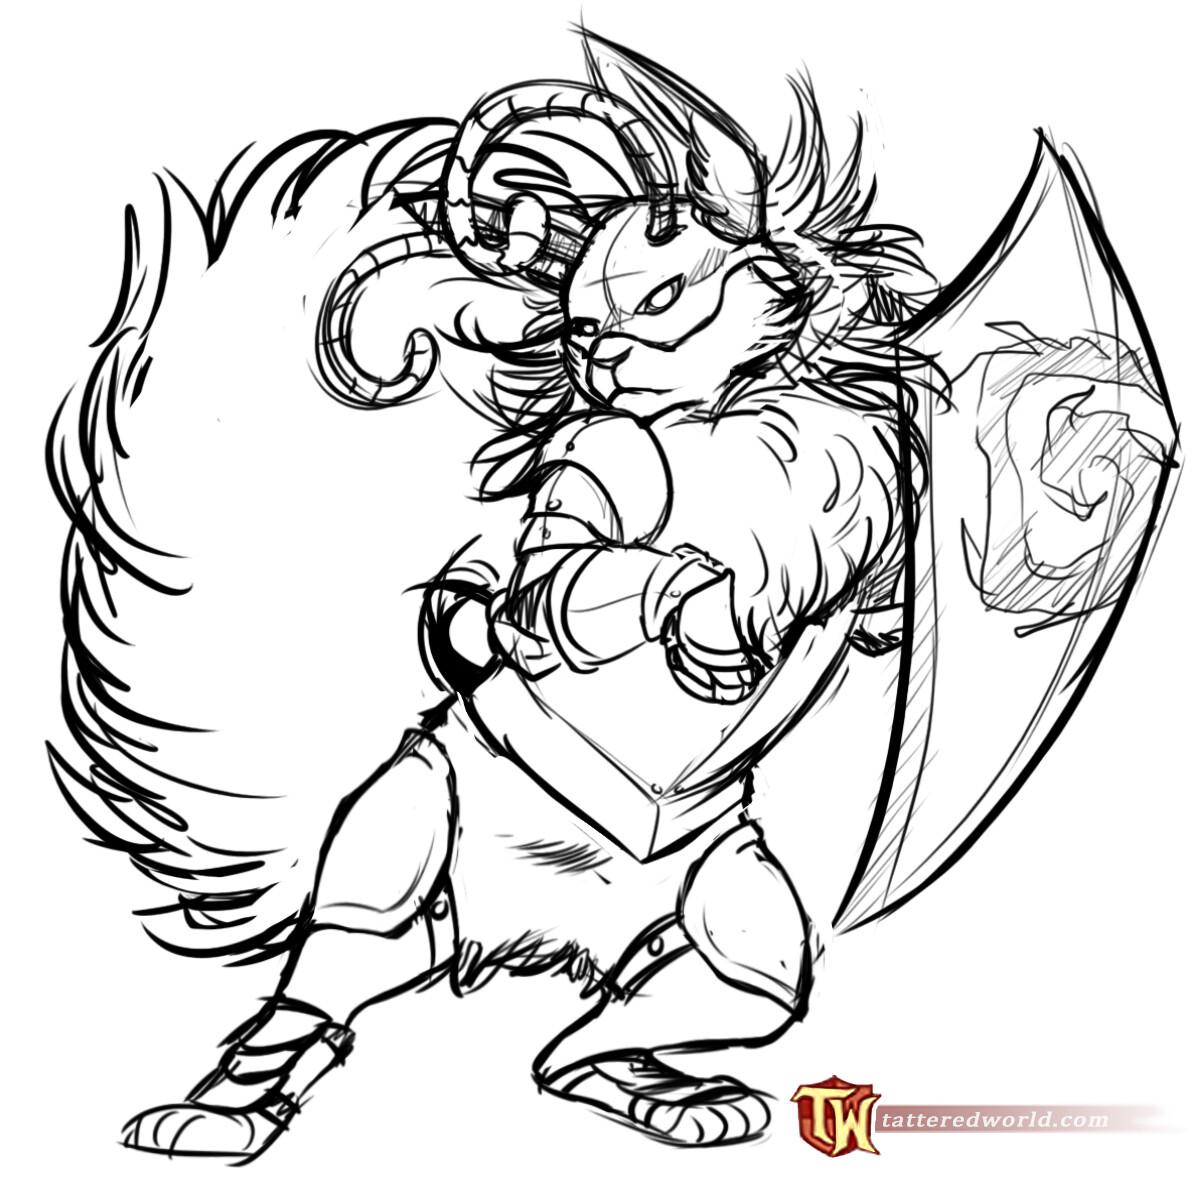 Unused Concept Sketch for Bumblebunee Hero Stage